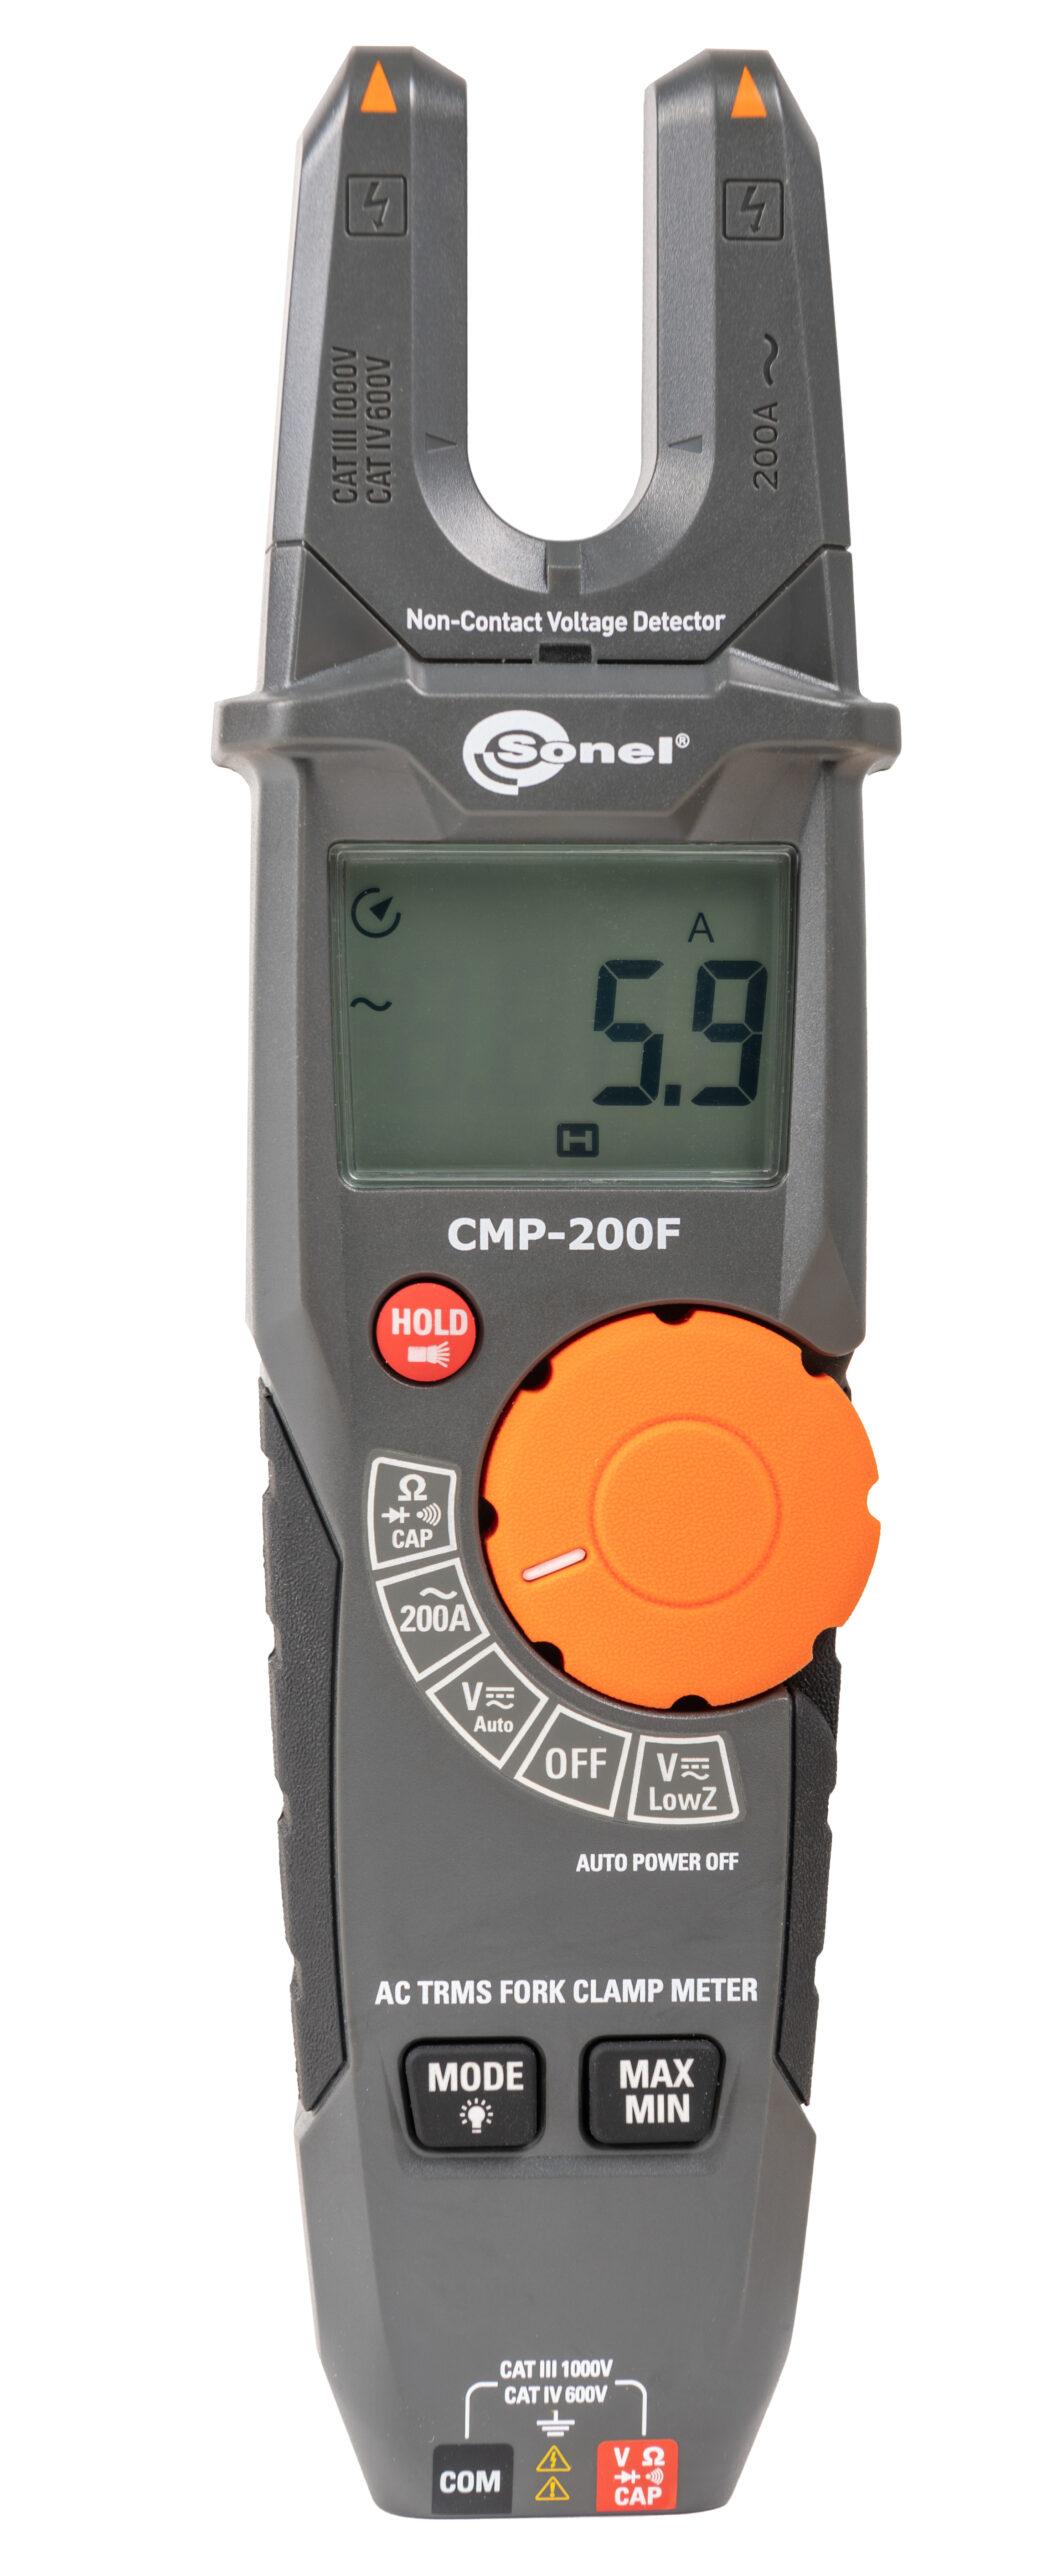 Sonel CMP-200F